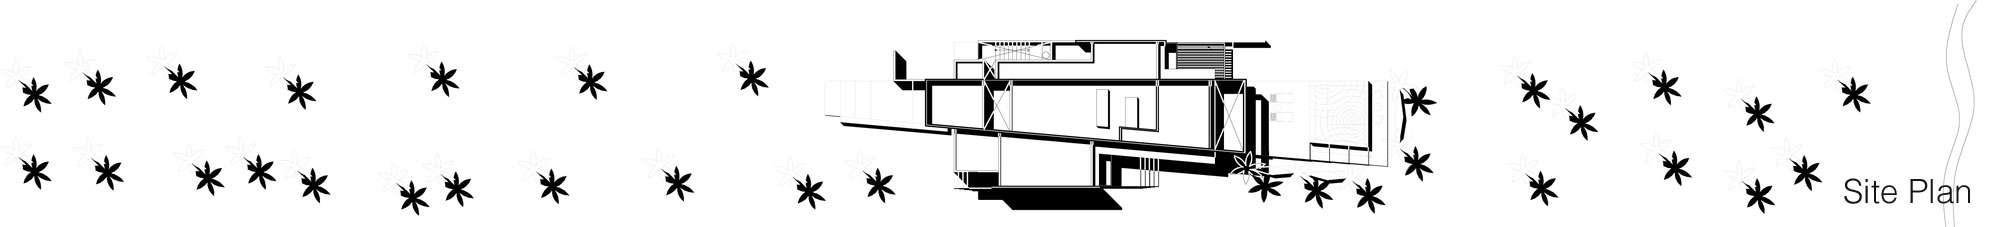 Tuunich Kanab by Seijo Peon Arquitectos (28)